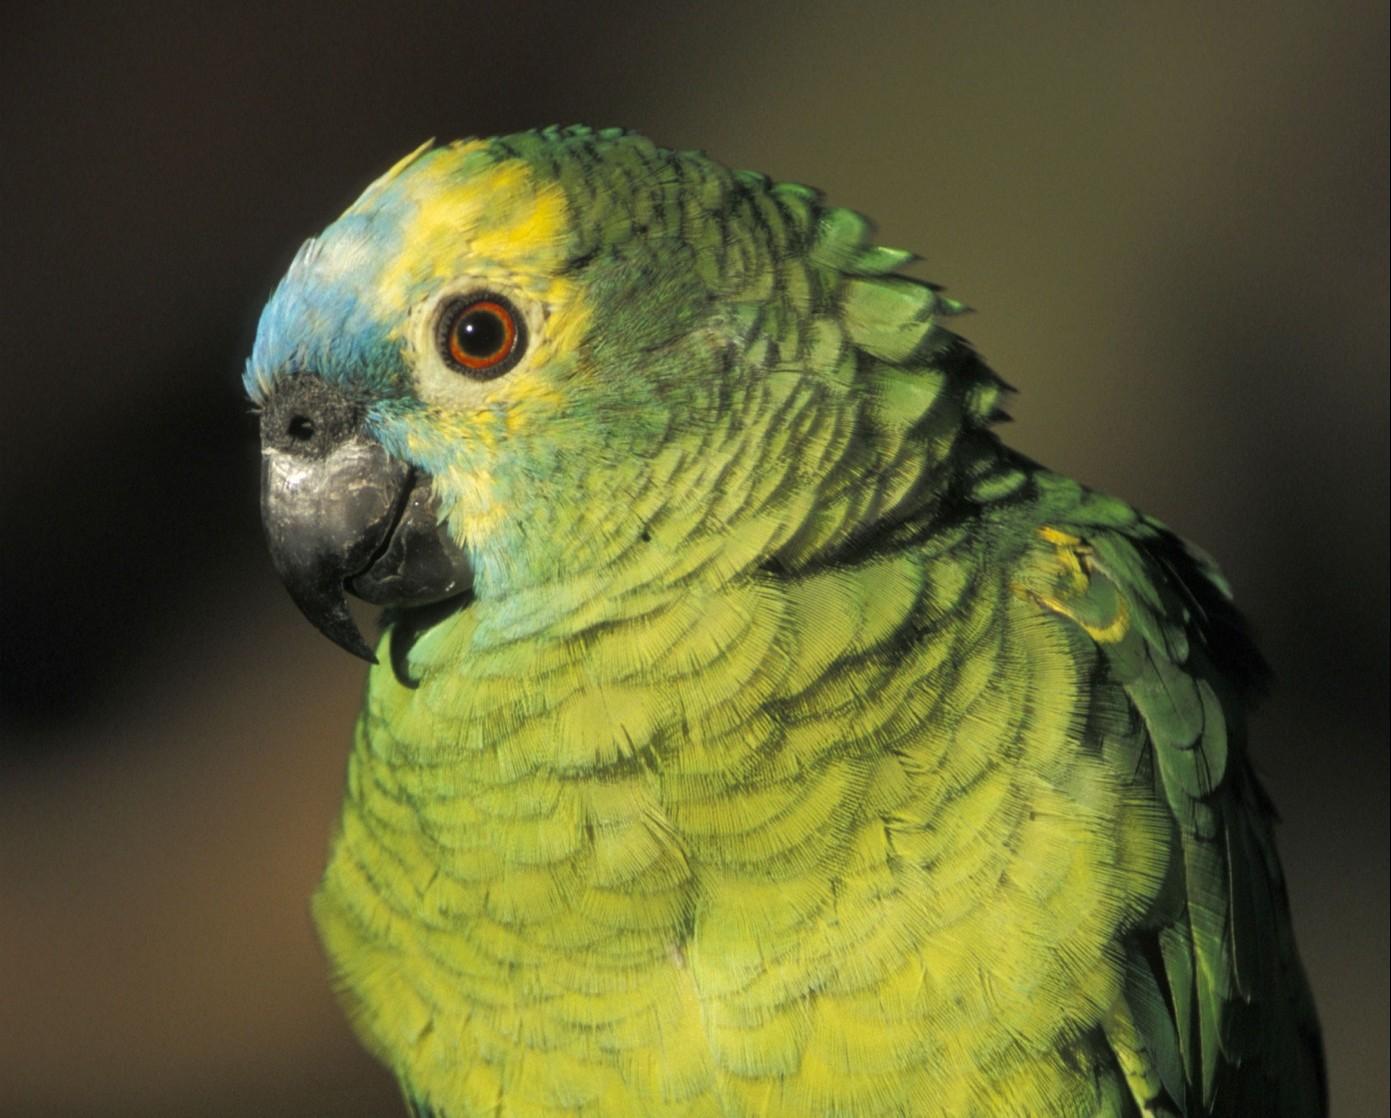 R027_020 -- Blue cheeked Amazon. -- © Francis Apesteguy Full-length article also available for publication. Article egalement disponible pour publication.